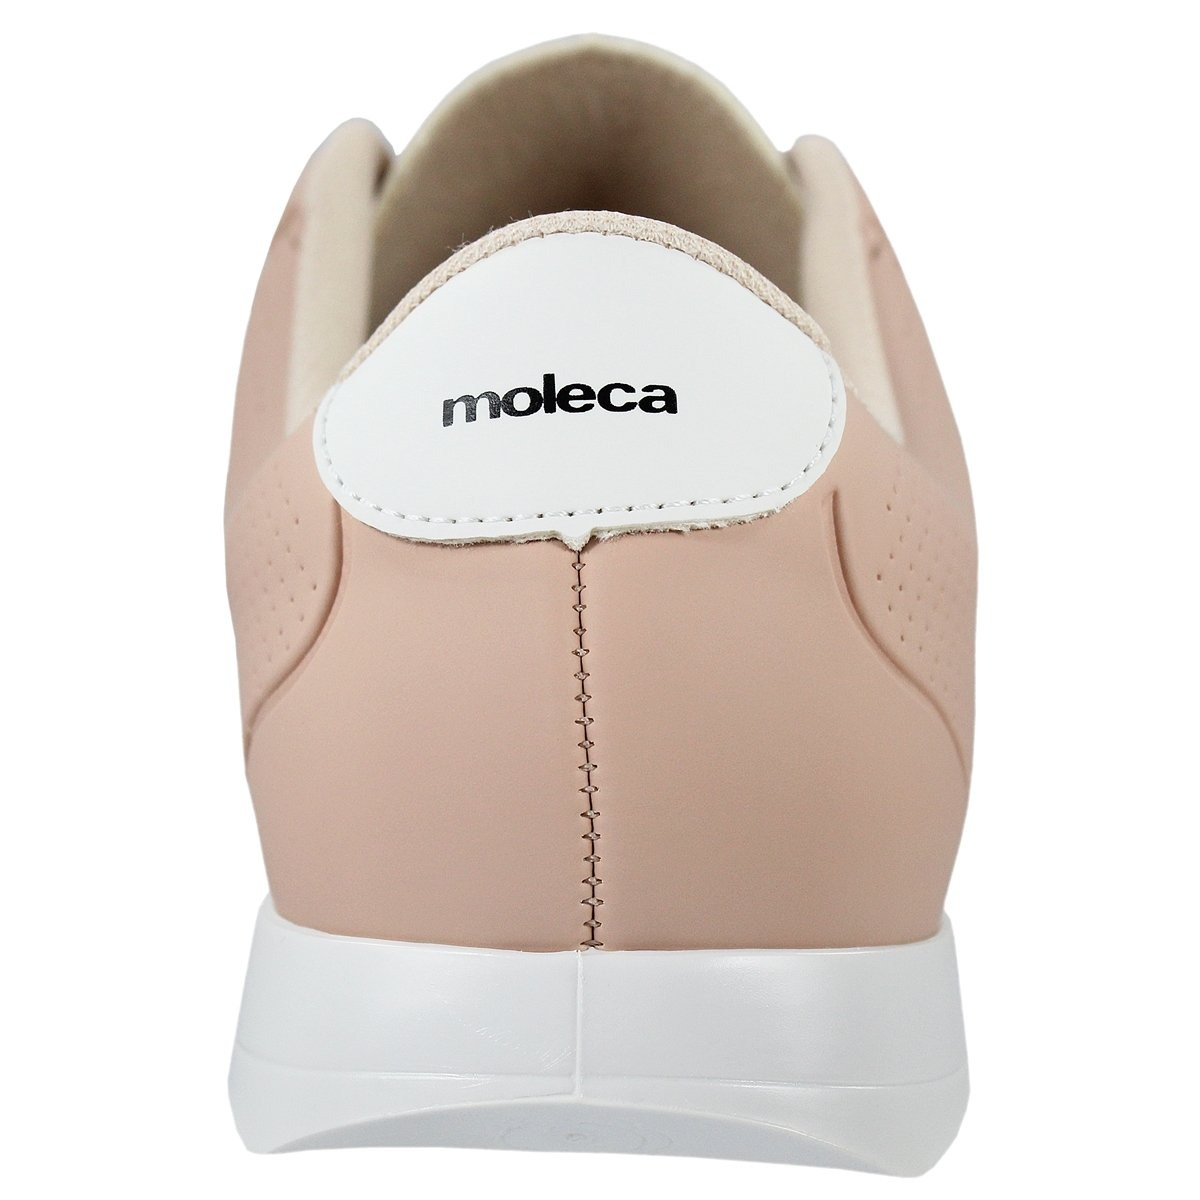 22f79ea02b Tênis Moleca Jogging Tira Lateral Feminino